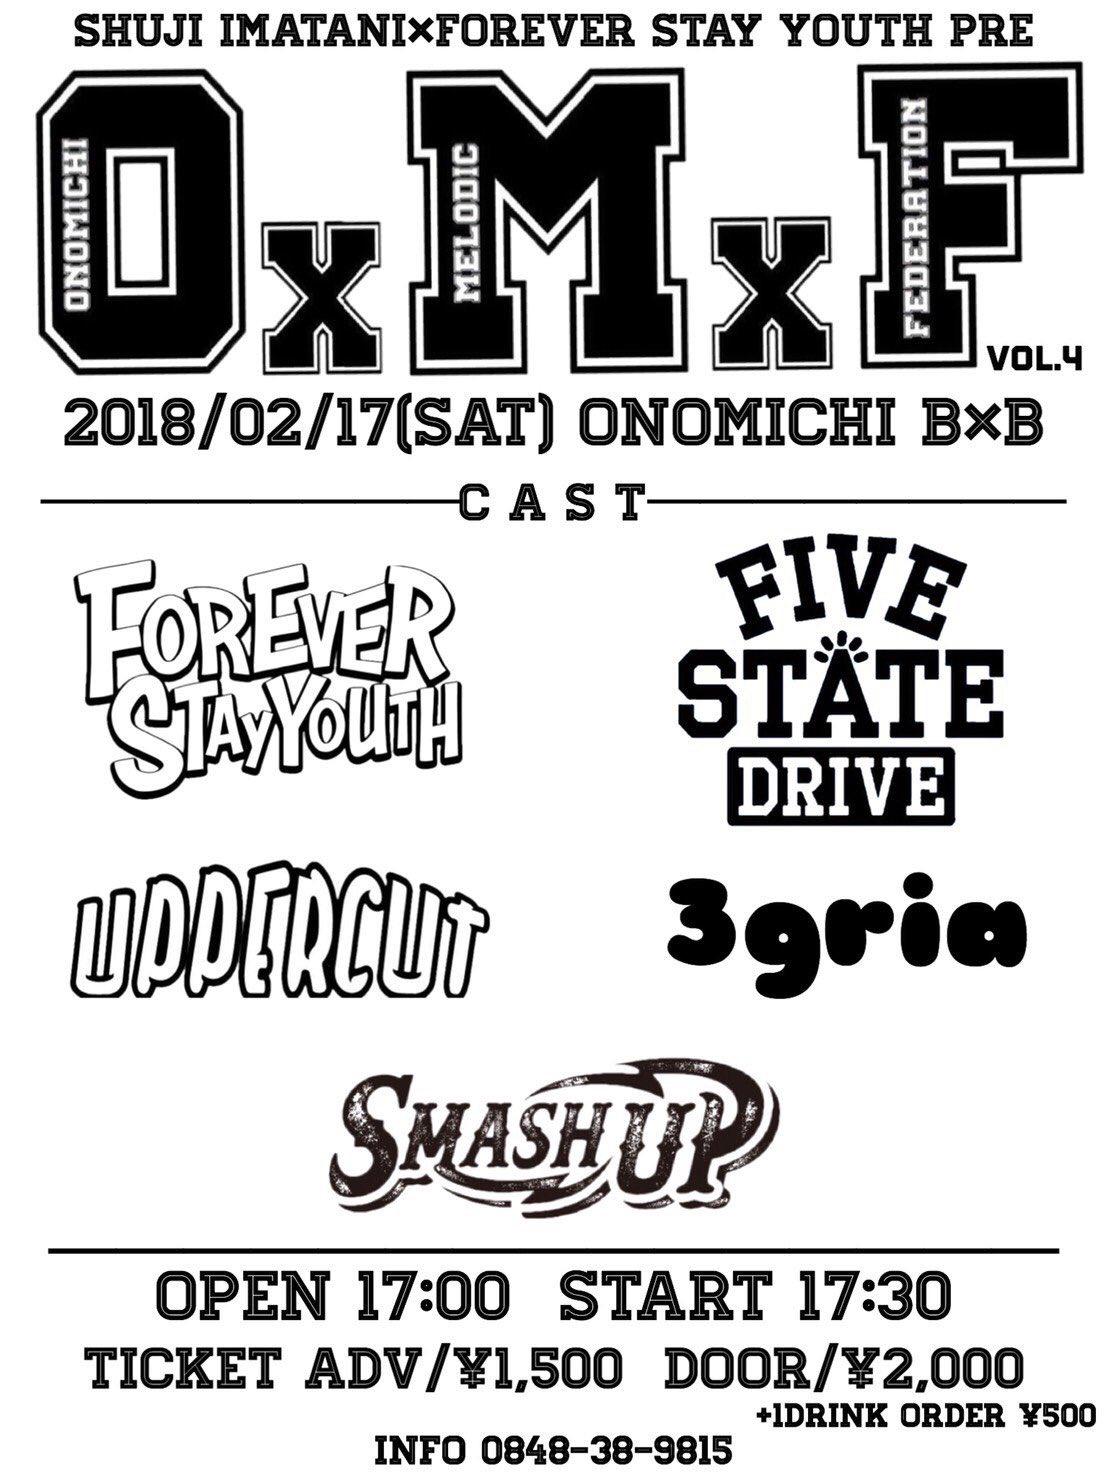 OxMxF vol.4